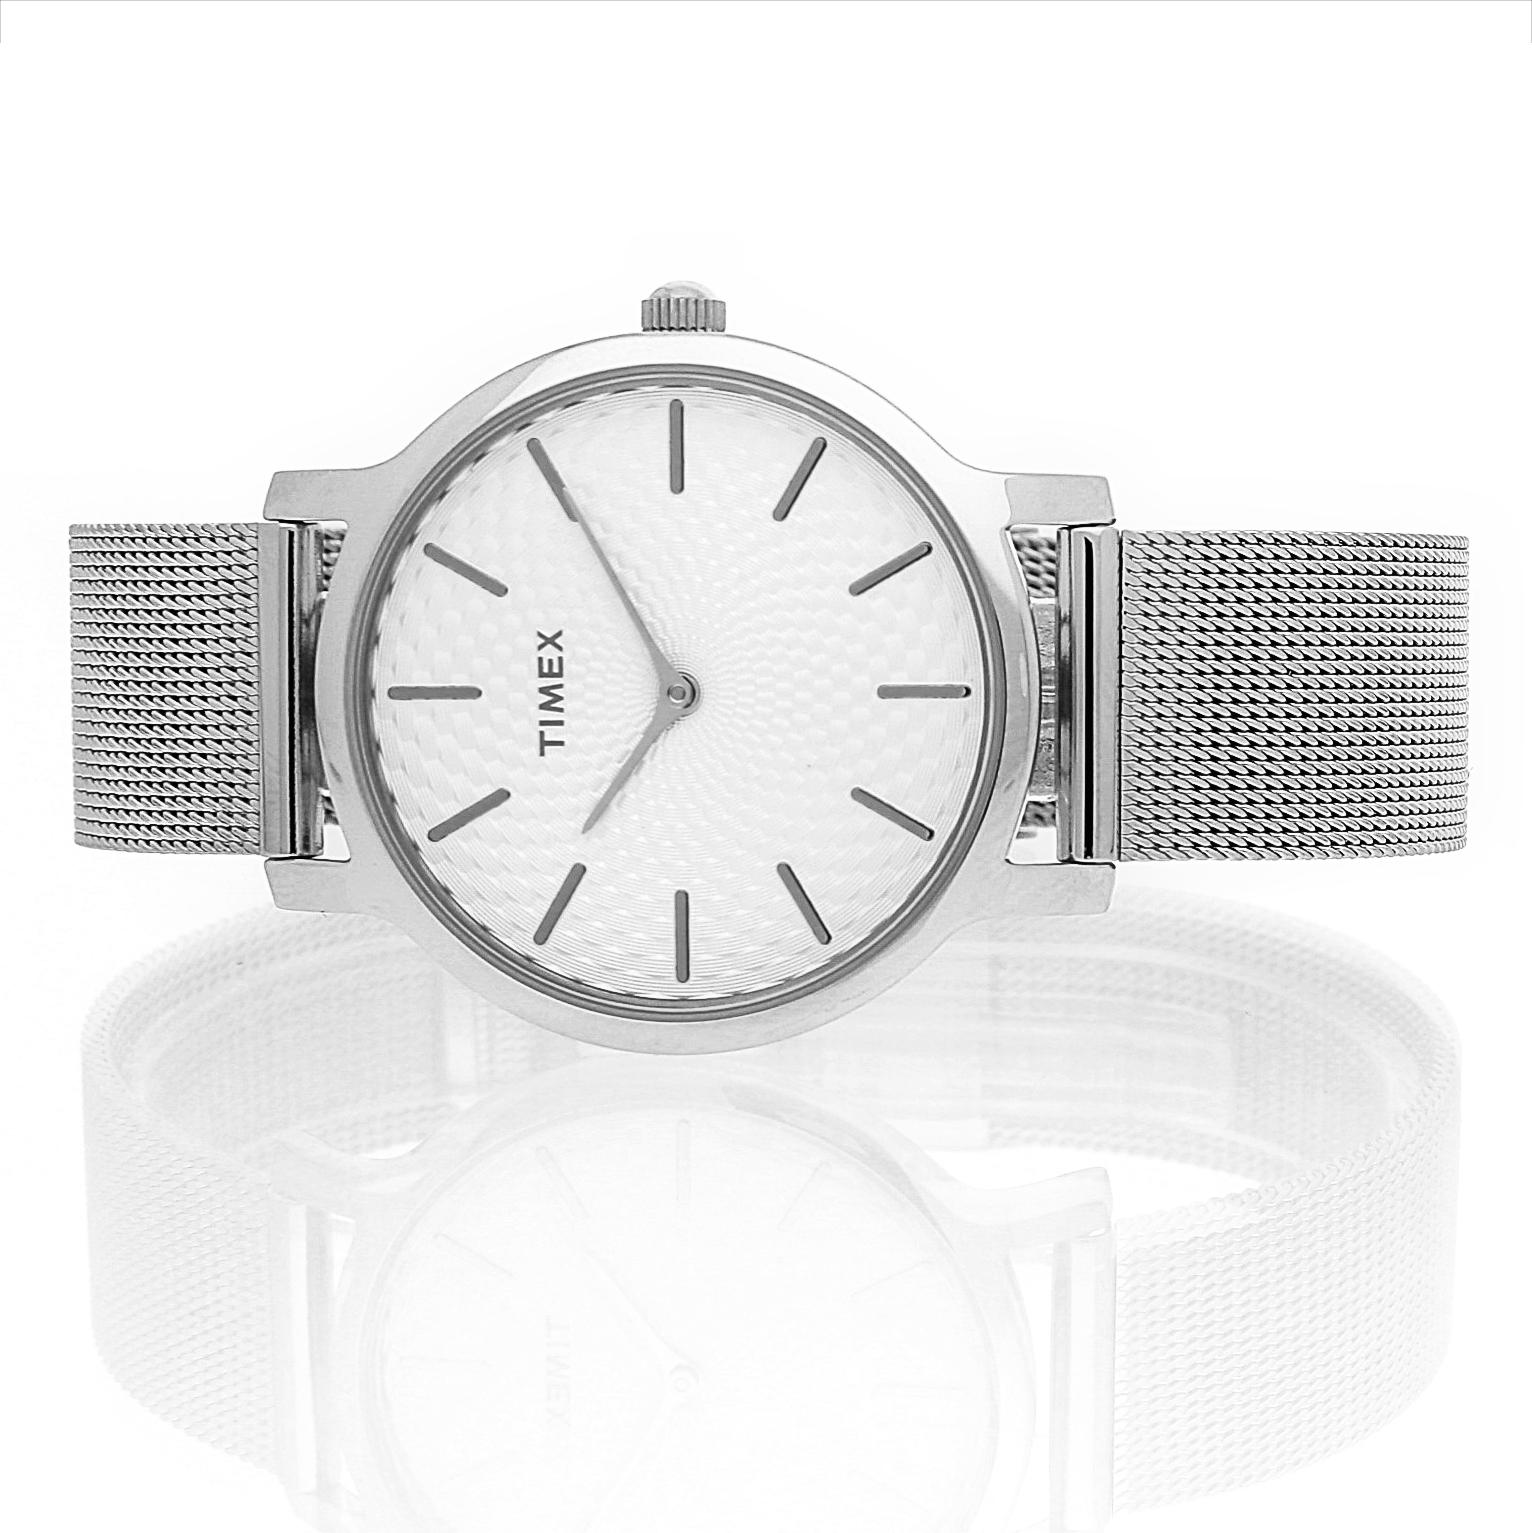 Zegarek damski Timex metropolitan TW2R36200 - duże 5